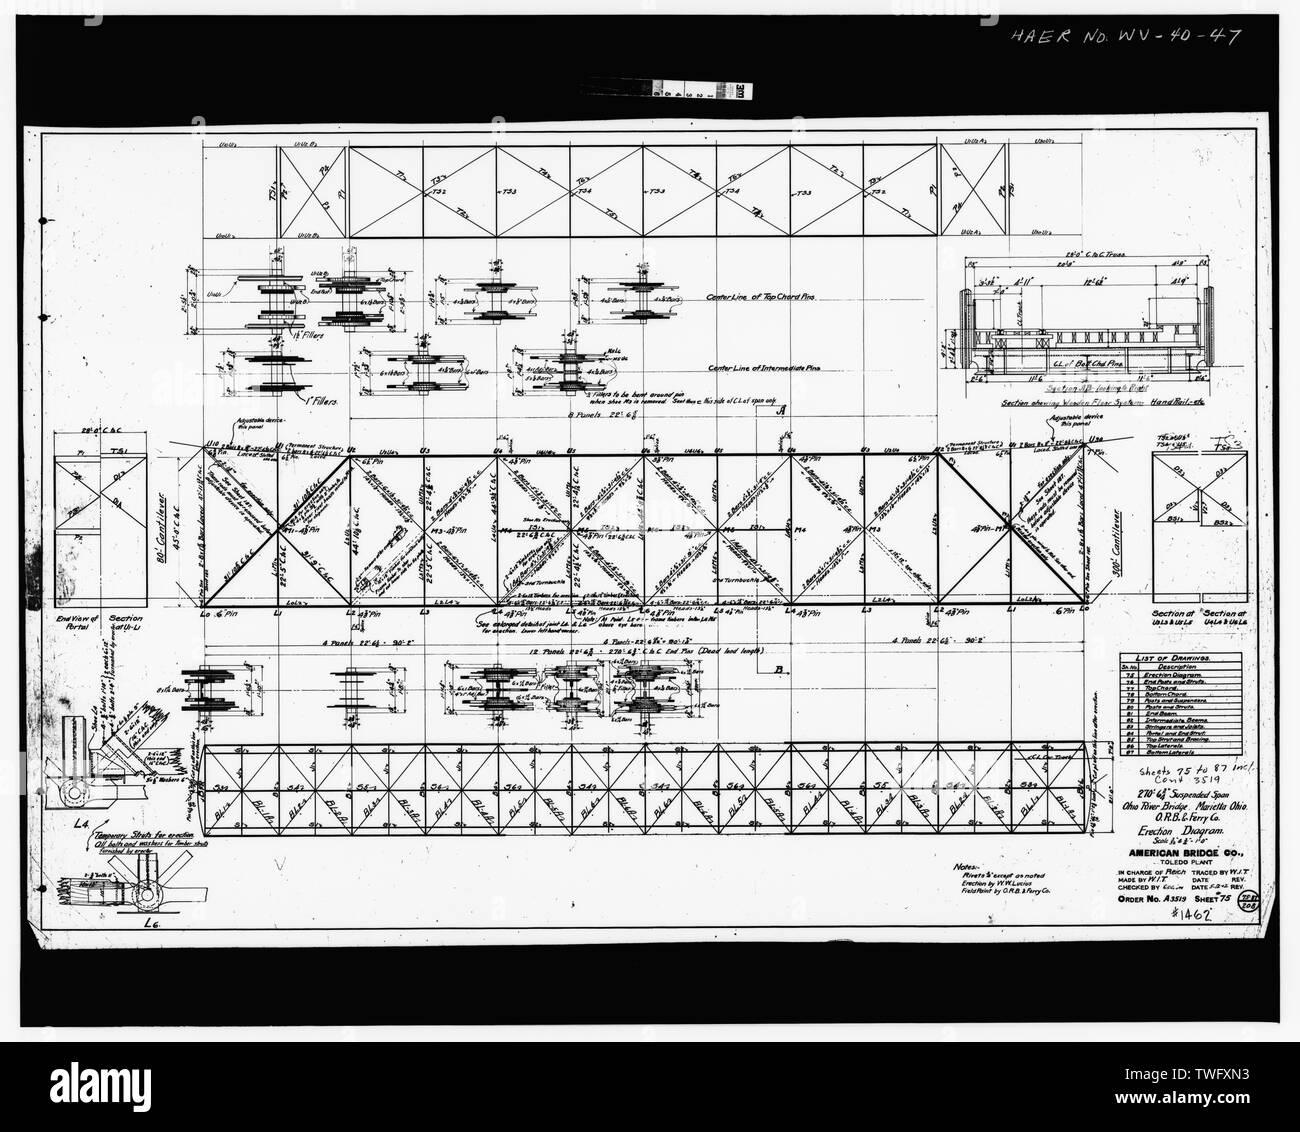 Plan Sheet -75 - Williamstown-Marietta Bridge, Spanning Ohio River between Williamstown and Marietta, Williamstown, Wood County, WV; American Bridge Company; Strobel, Charles L; Ripley, T M - Stock Image